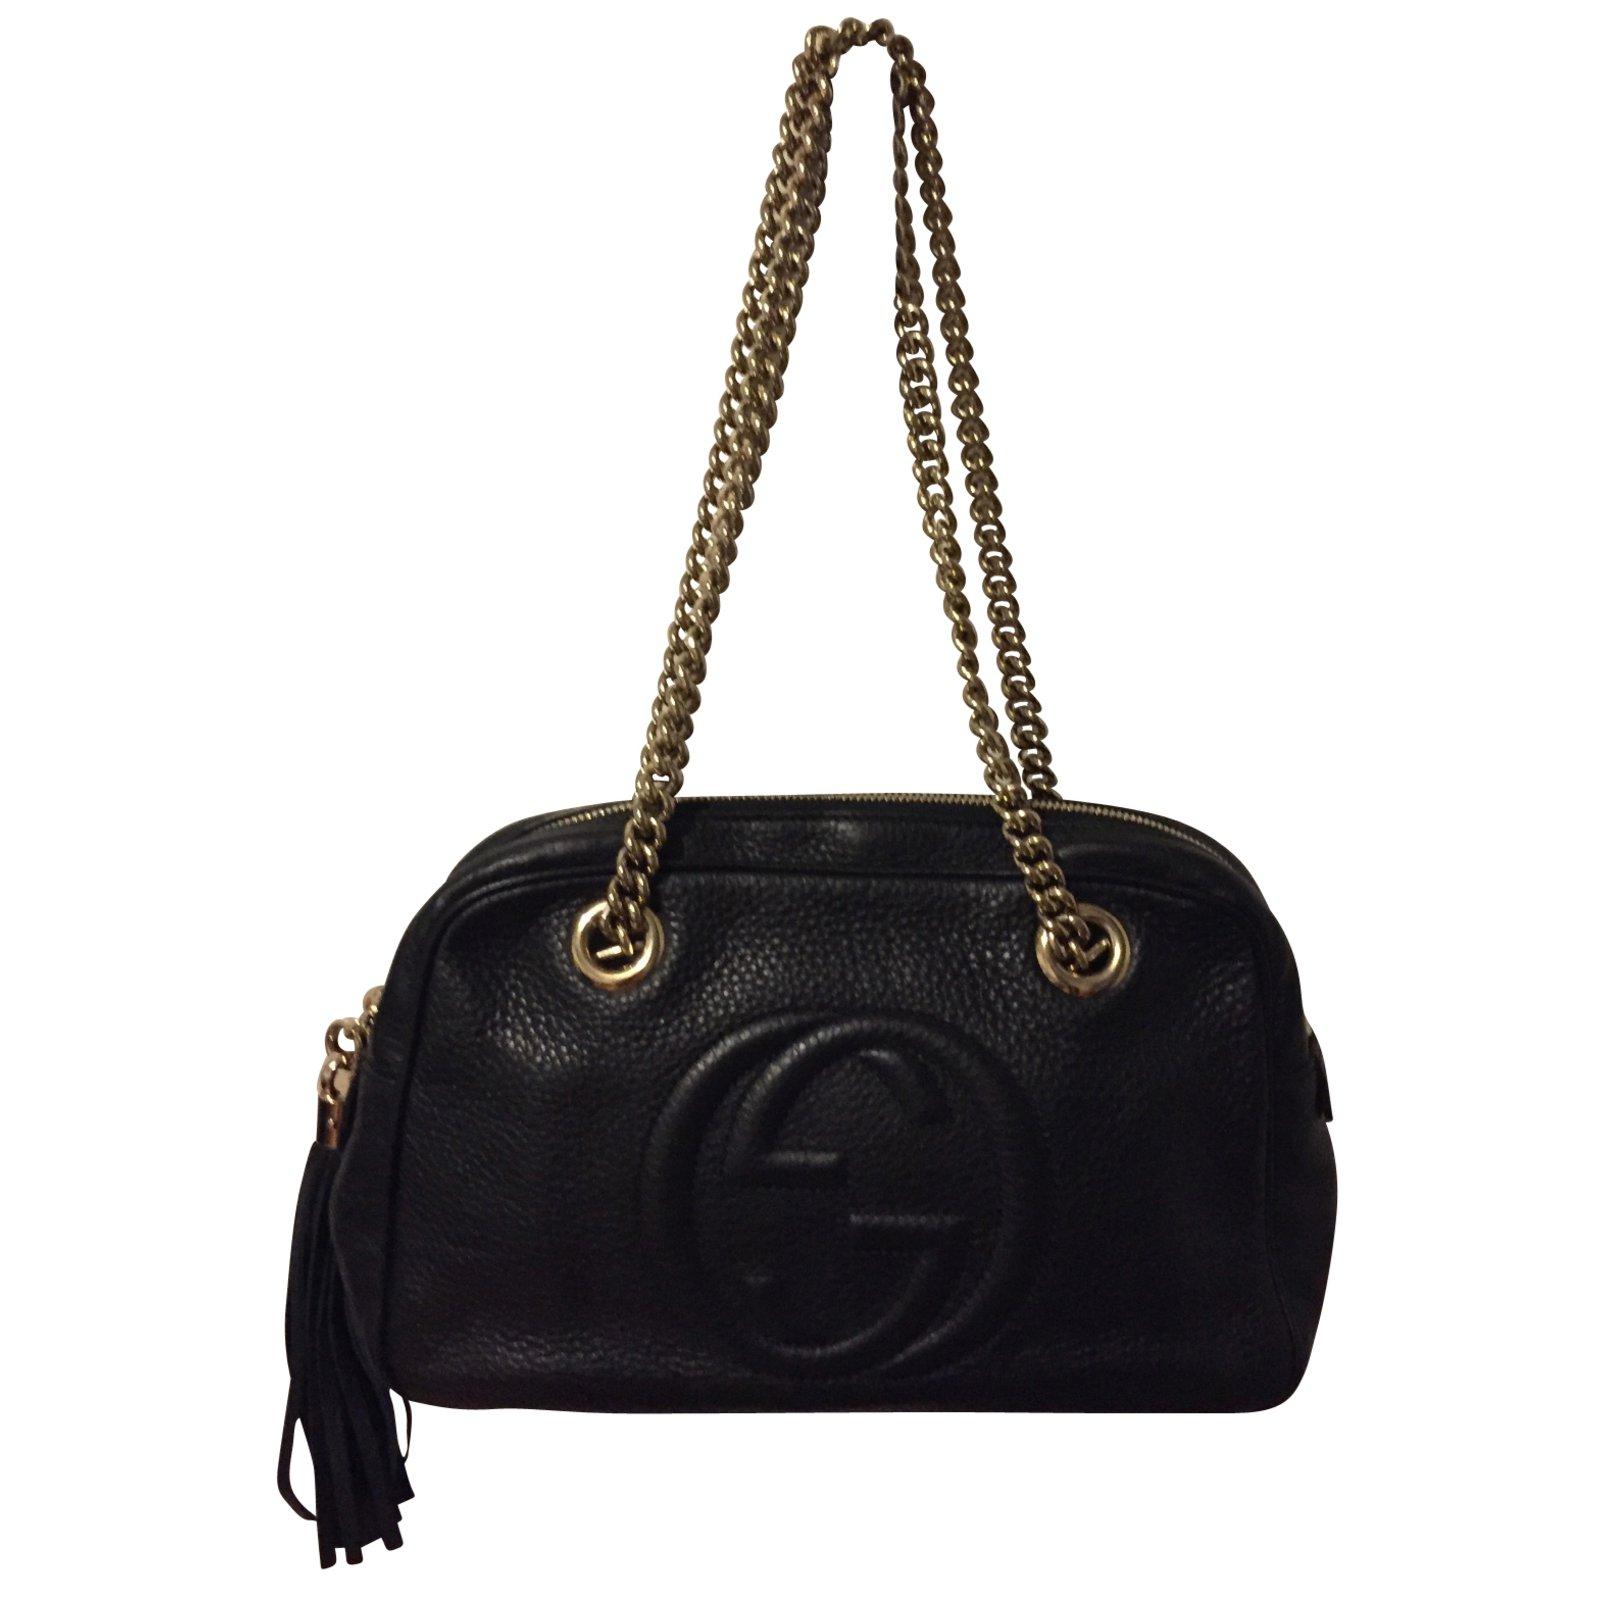 Sac à Main Bandoulière Gucci : Sacs ? main gucci soho cuir noir ref joli closet